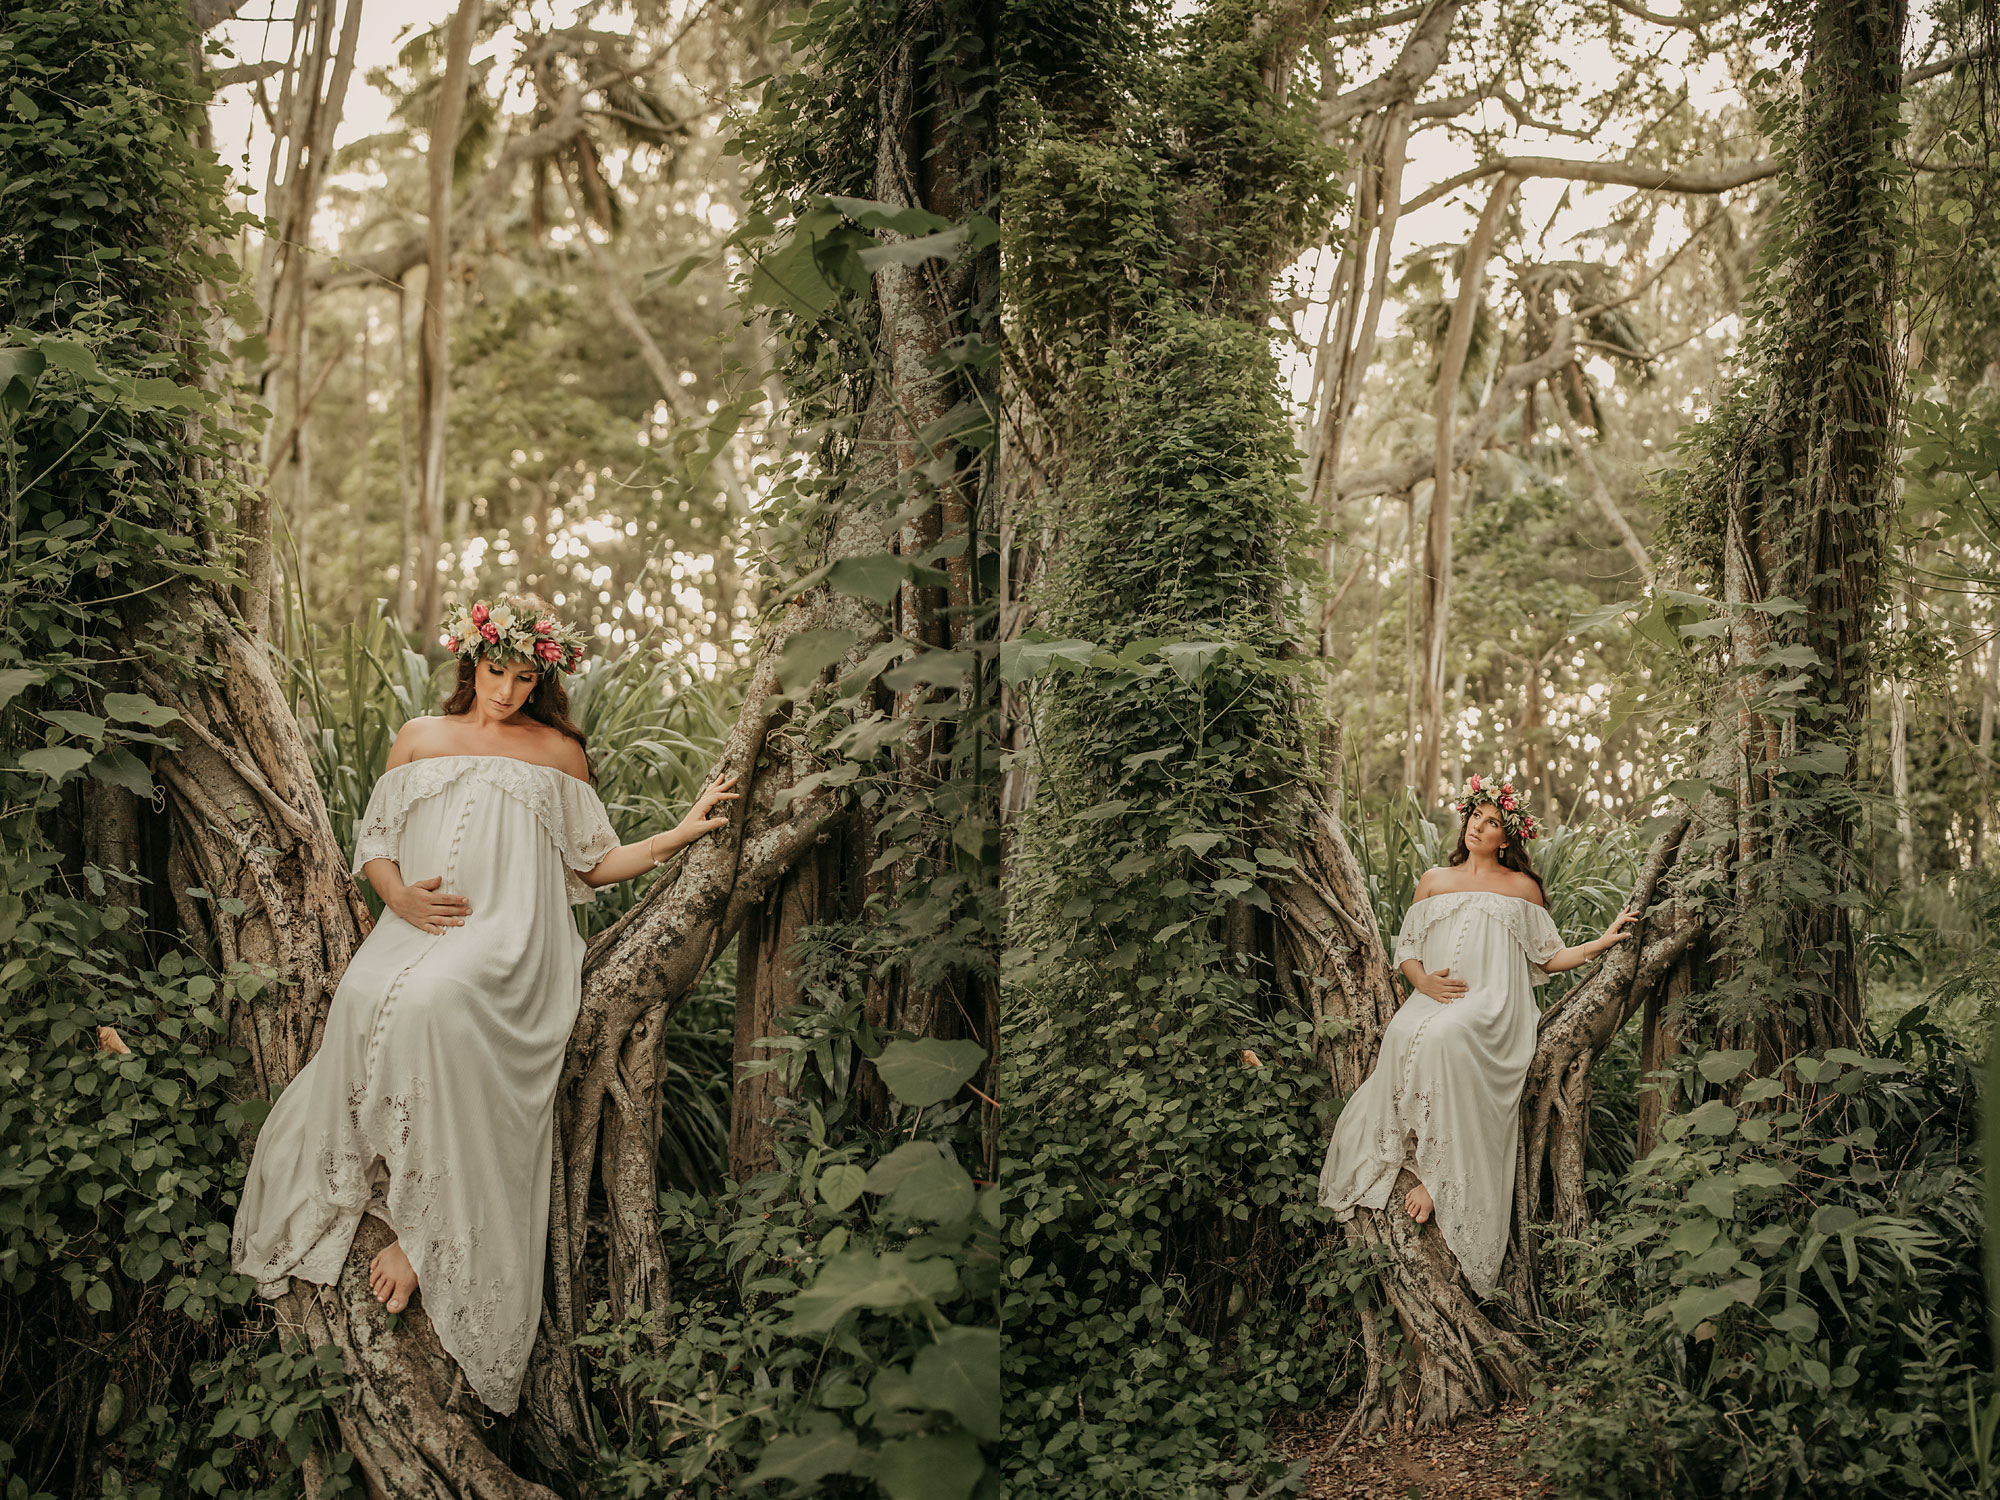 Hawaii-Oahu-Maternity-Photography-The-Sophia-Co-008.jpg